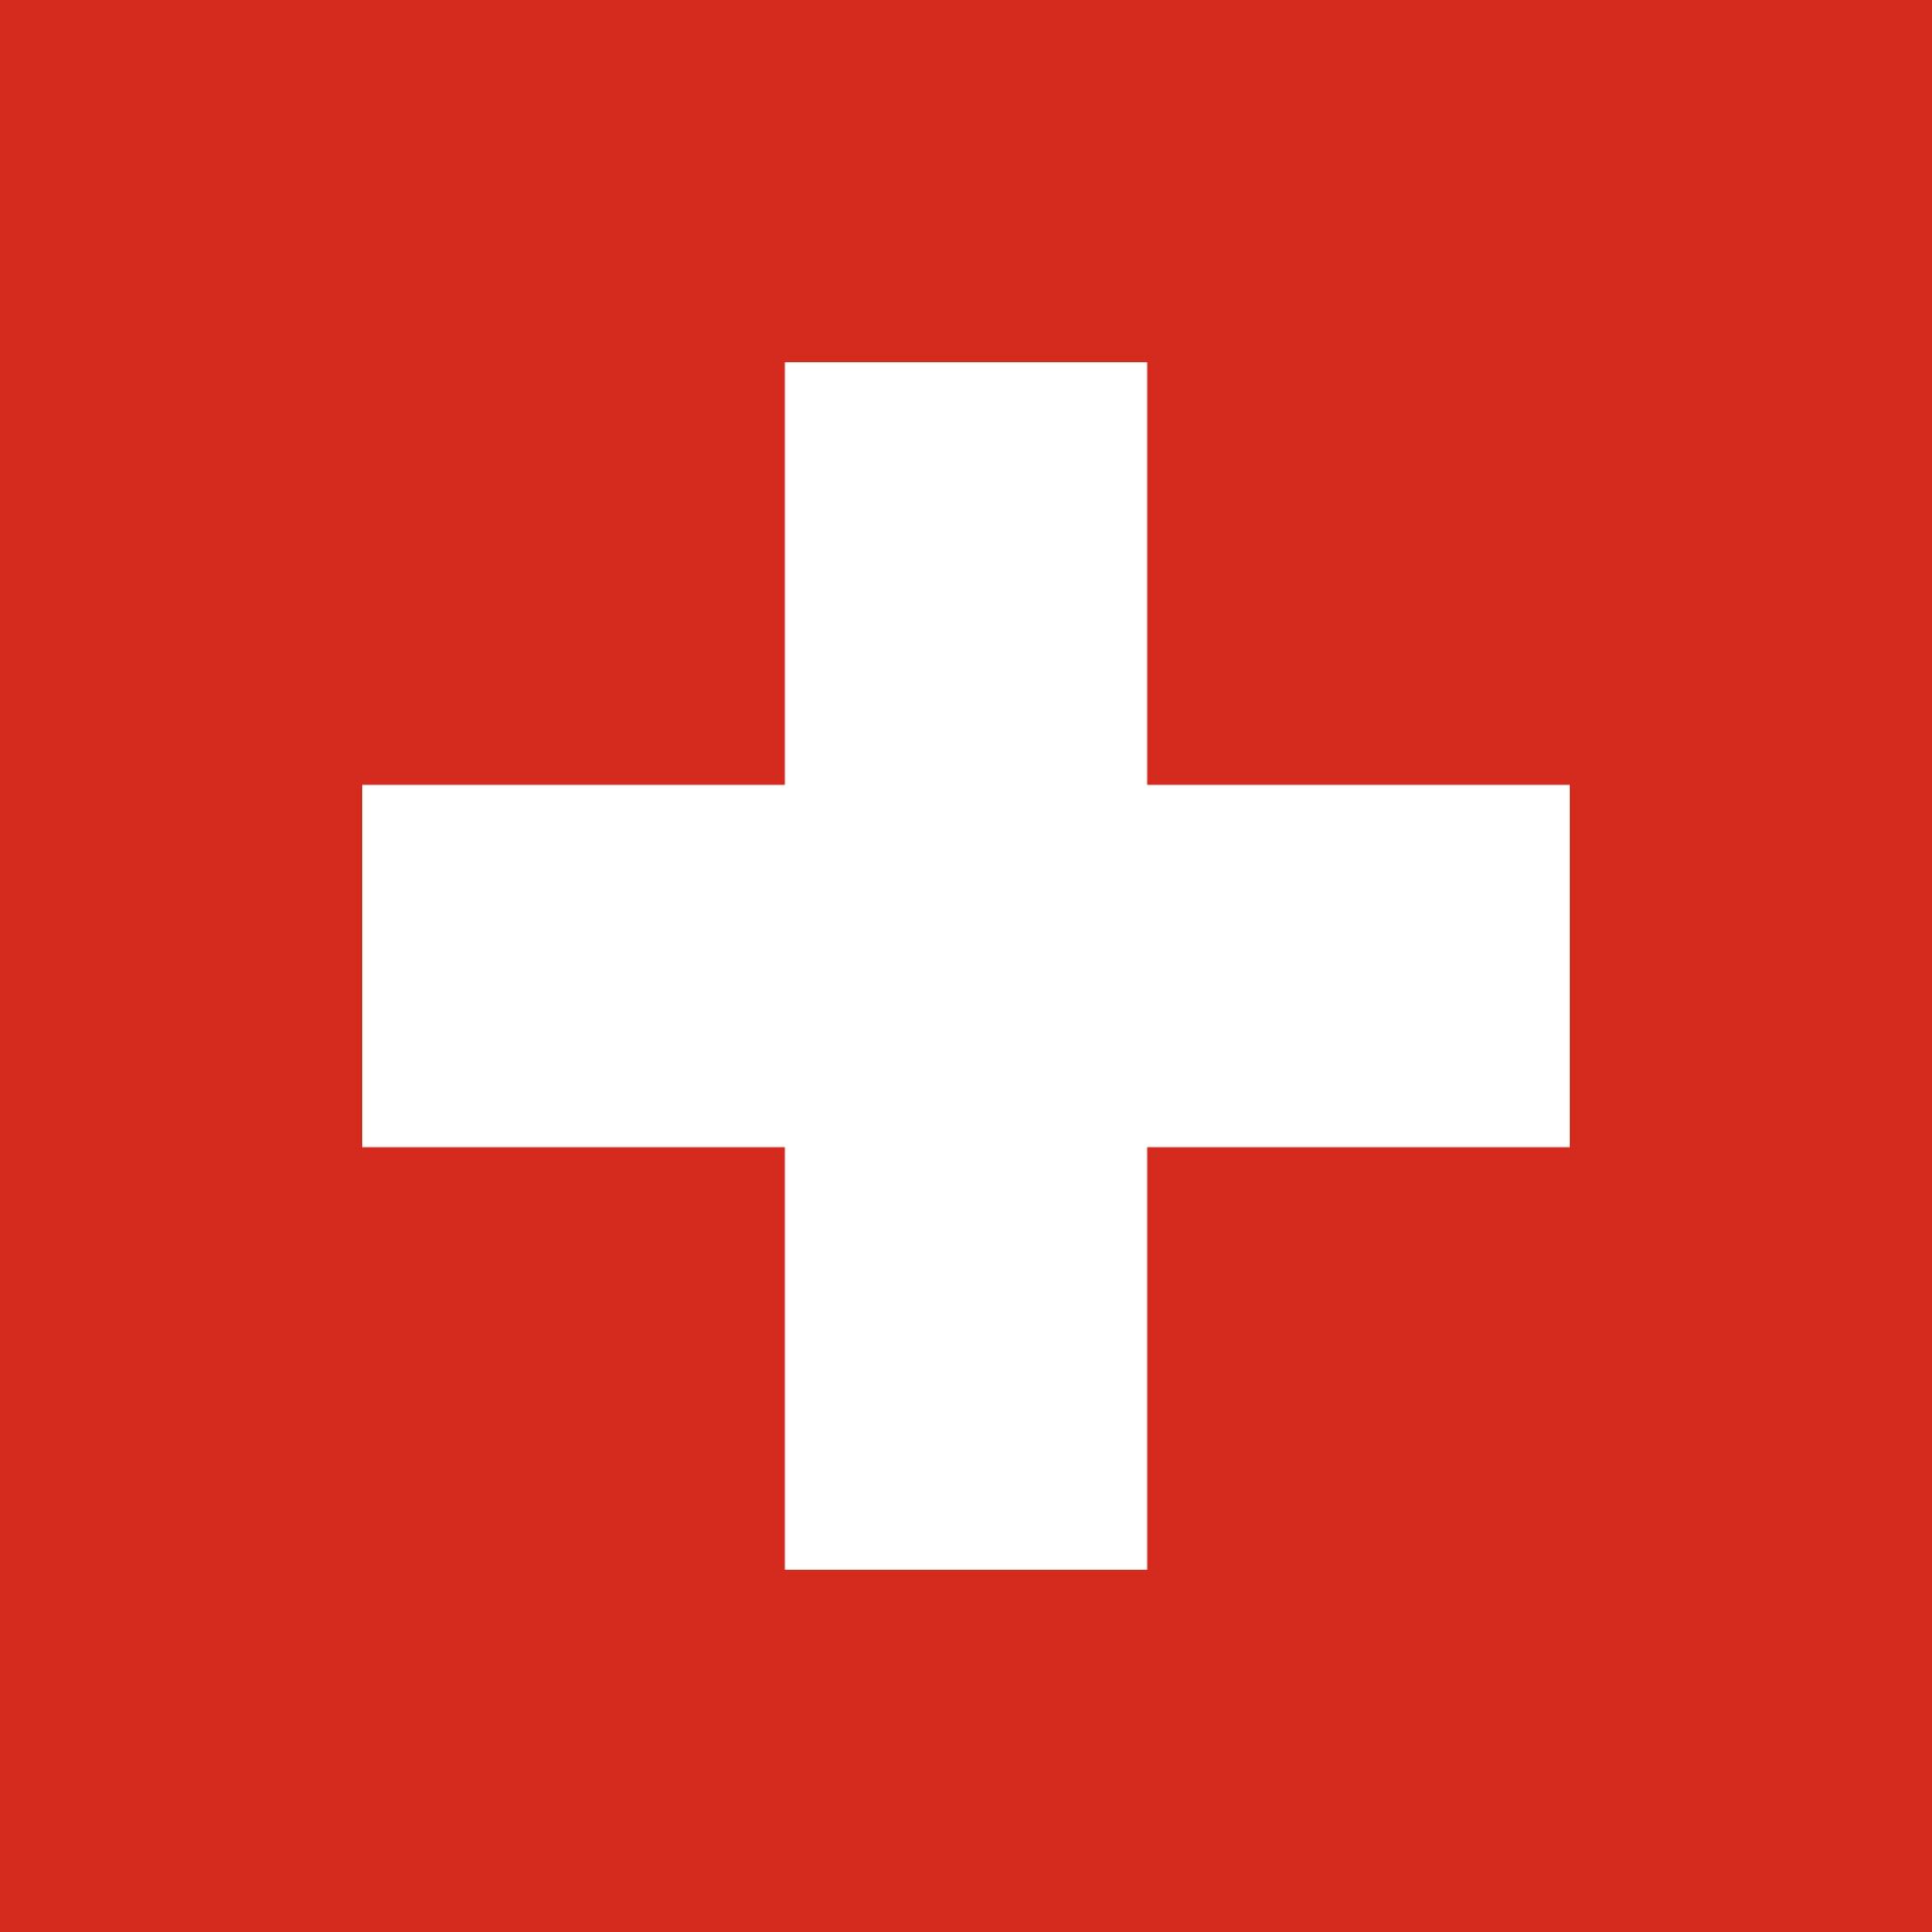 Federal Office of Civil Aviation FOCA, Switzerland